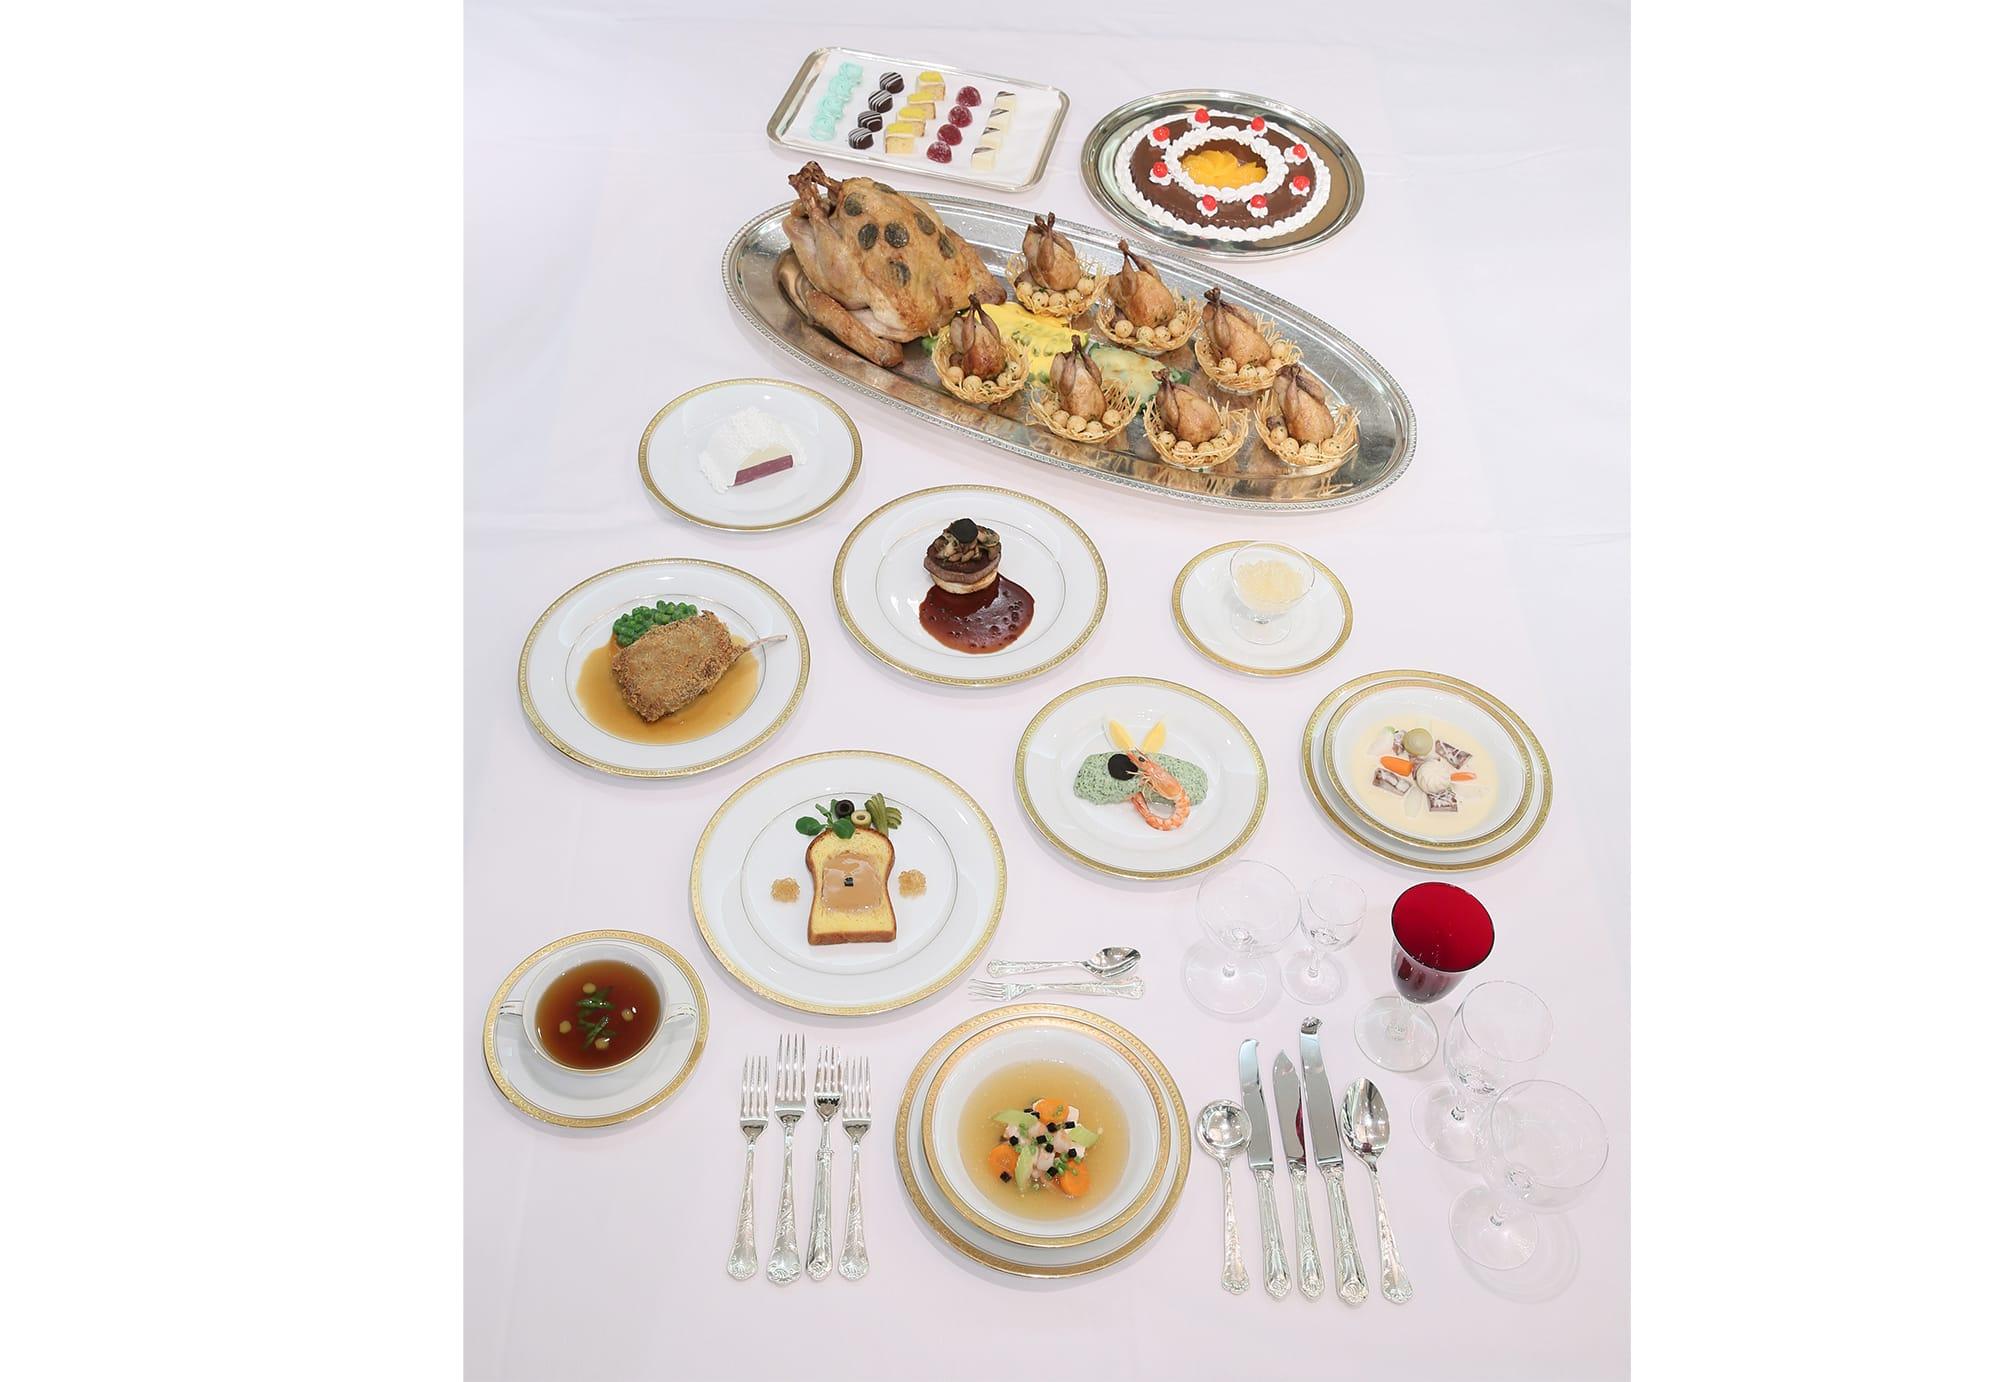 明治天皇の午餐会(1887(明治20)年5月13日)の料理の再現模型。明治記念館蔵